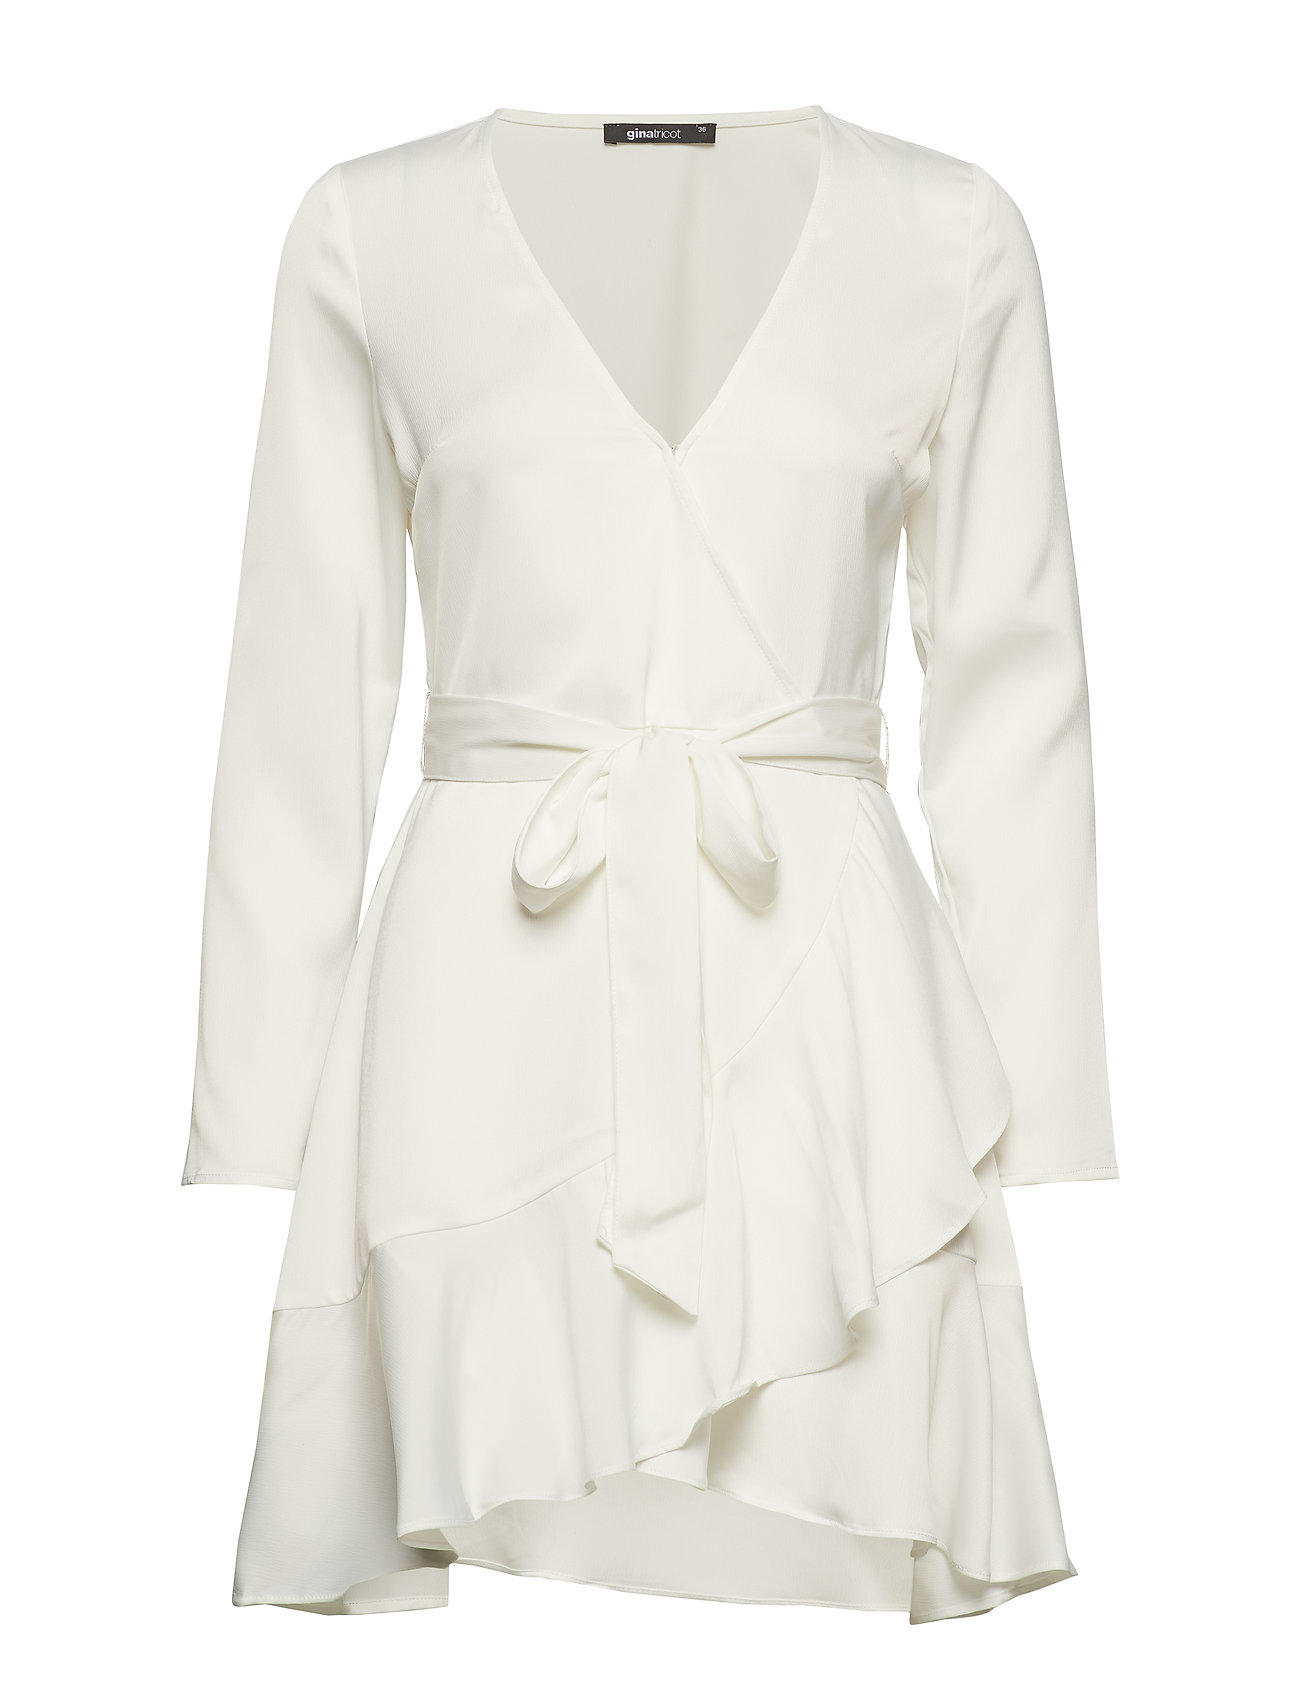 928f3adc60e2 Gina Tricot korte kjoler – Elina Wrap Dress til dame i Hvid - Pashion.dk